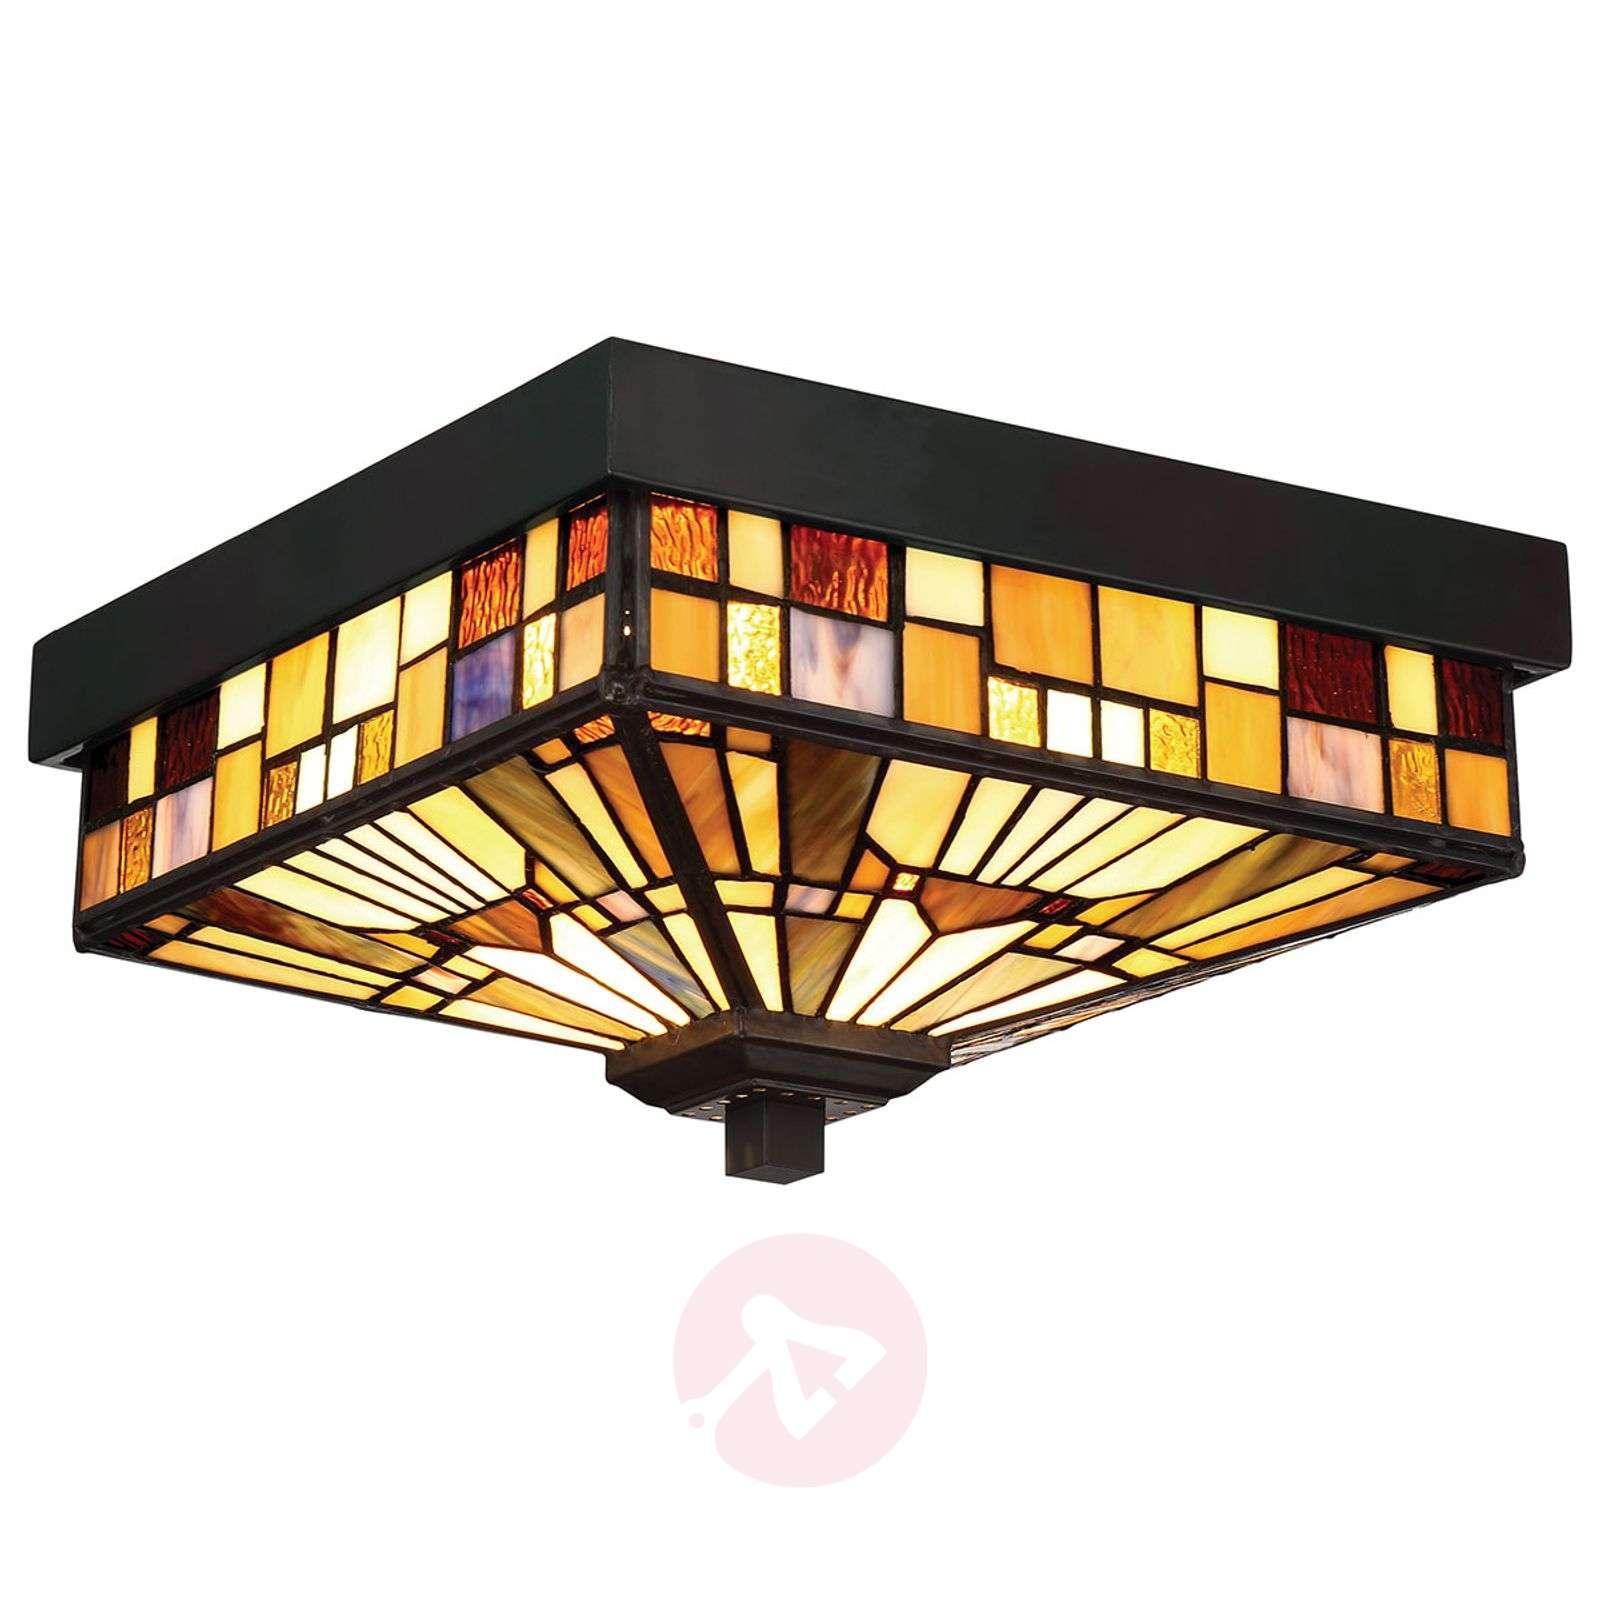 Outdoor ceiling light Inglenook, Tiffany design-3048939-01